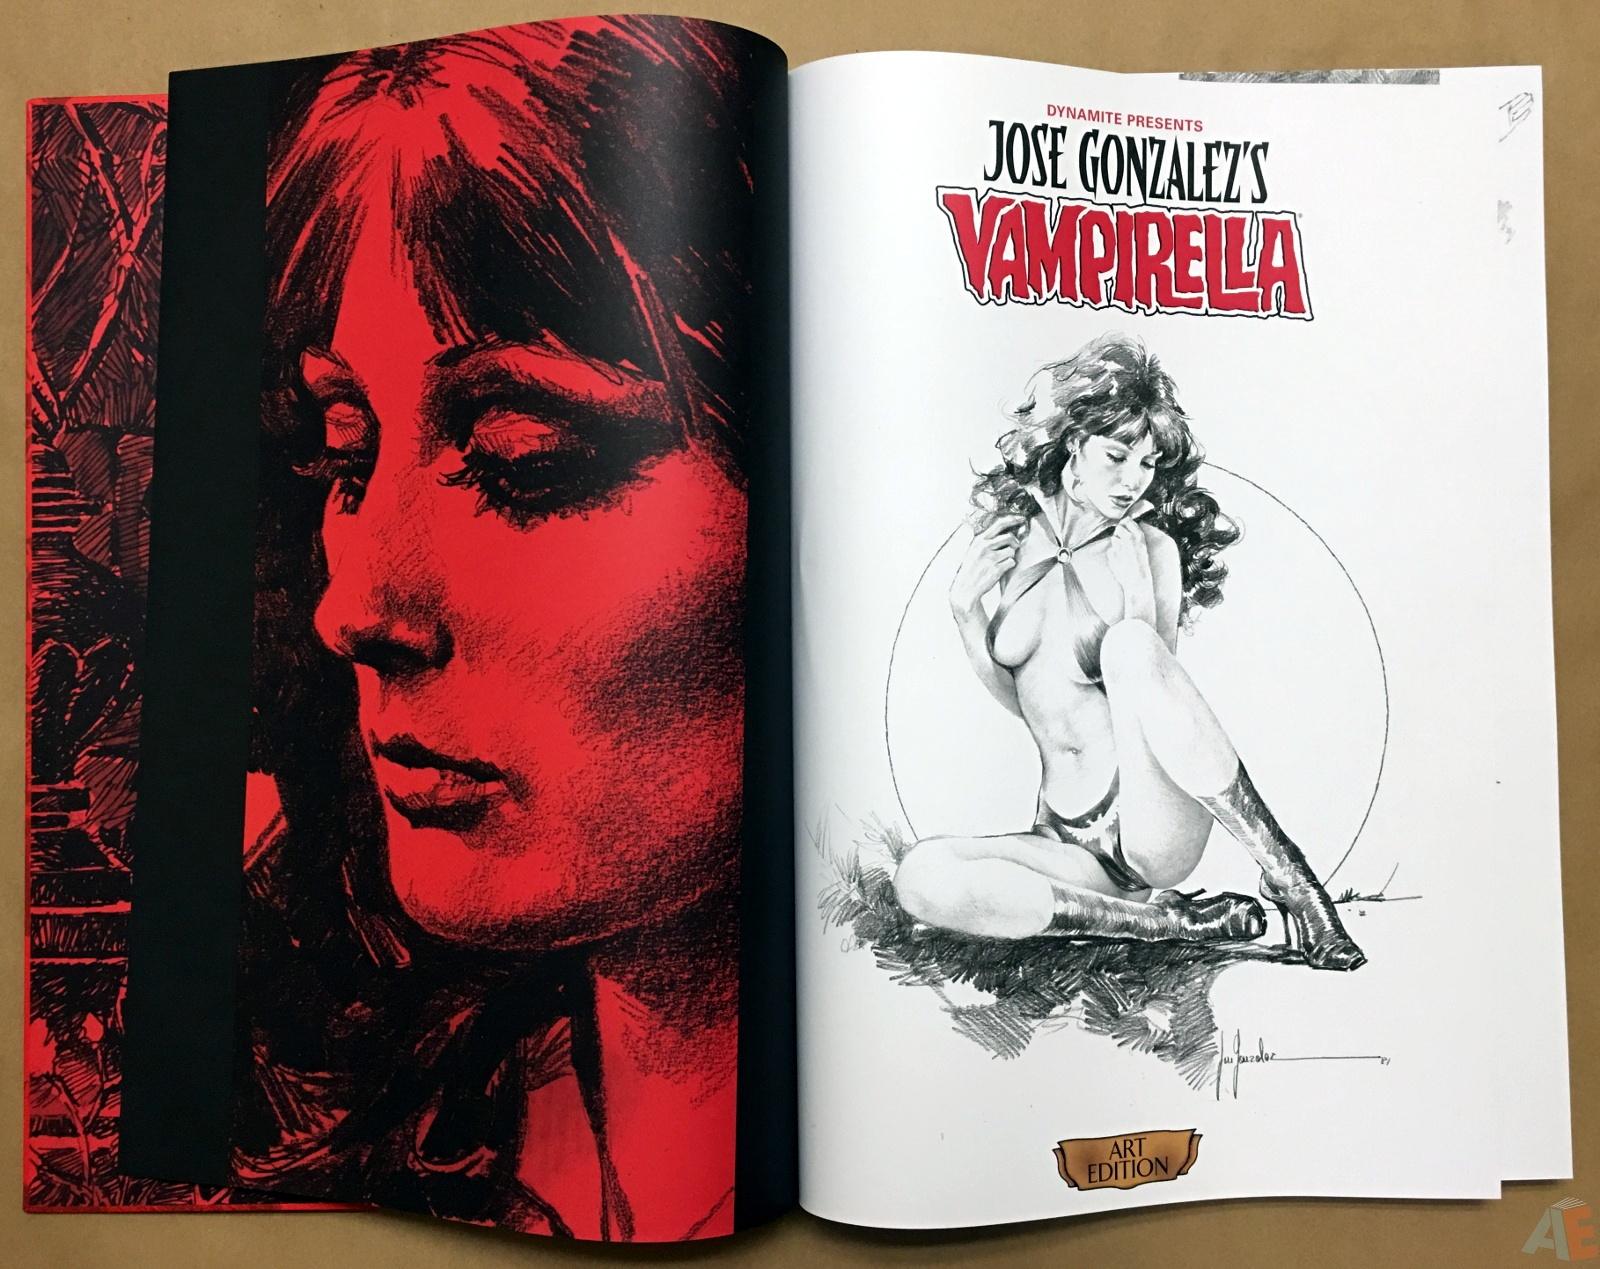 Jose Gonzalez's Vampirella Art Edition Vol 1 4